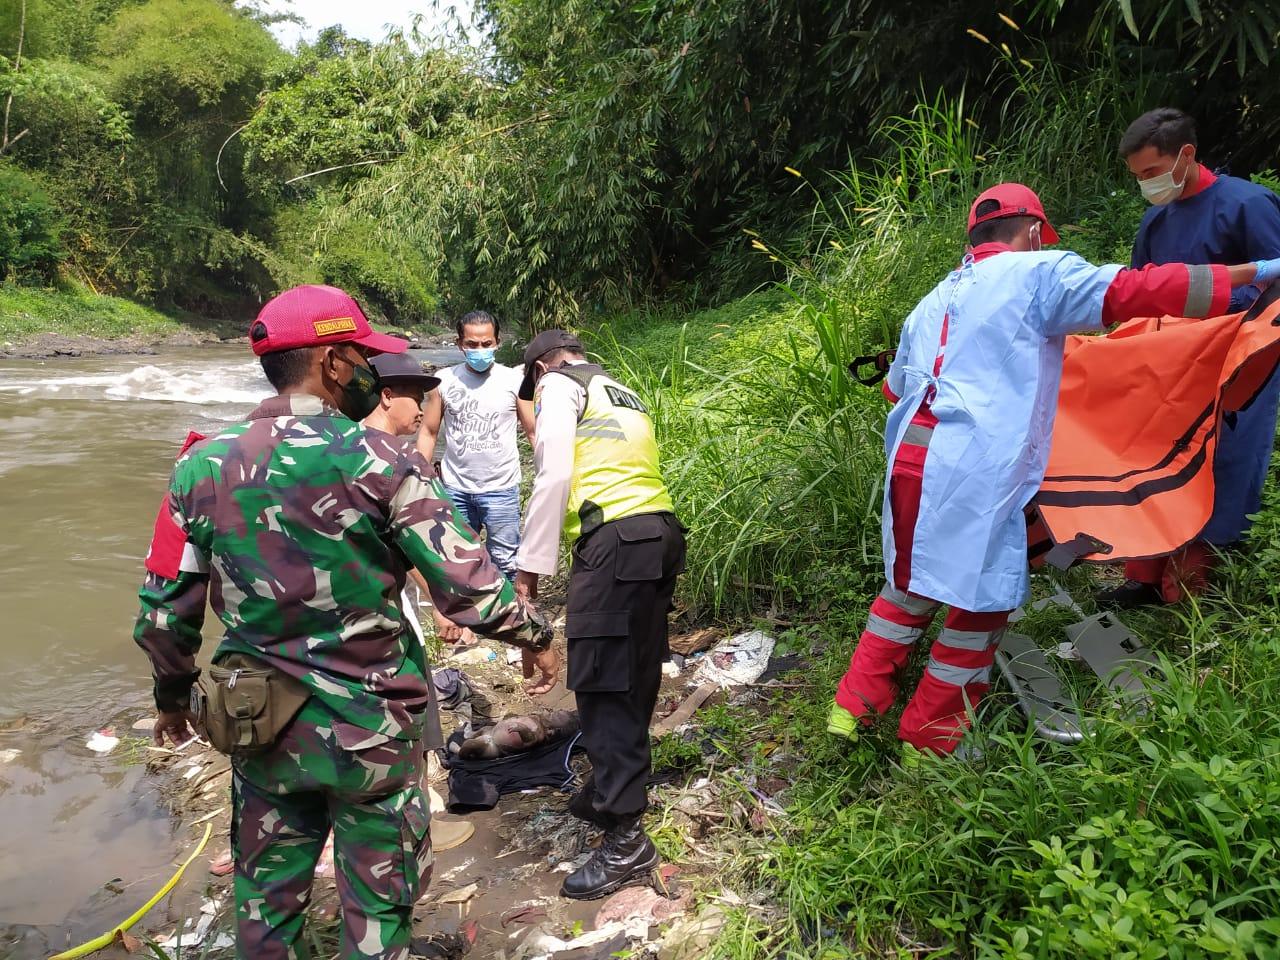 Proses evakuasi mayat bayi di Sungai Brantas. (Foto: Polsek Pakisaji/Tugu Jatim)